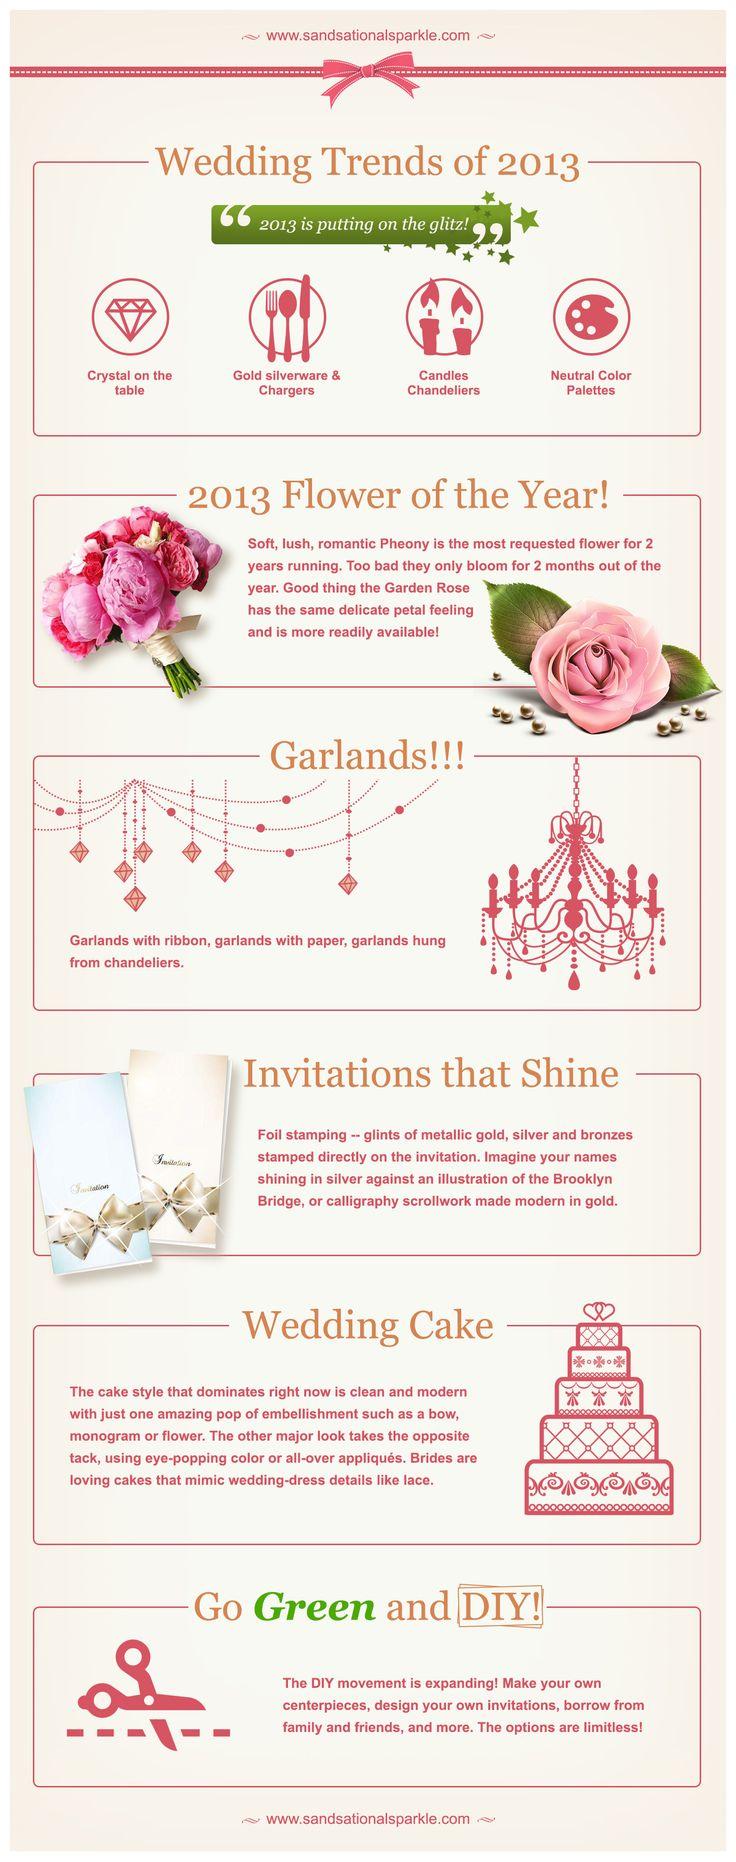 http://www.weddingsandblog.com/wedding-planning-tips/putting-on-the-glitz-wedding-trends/